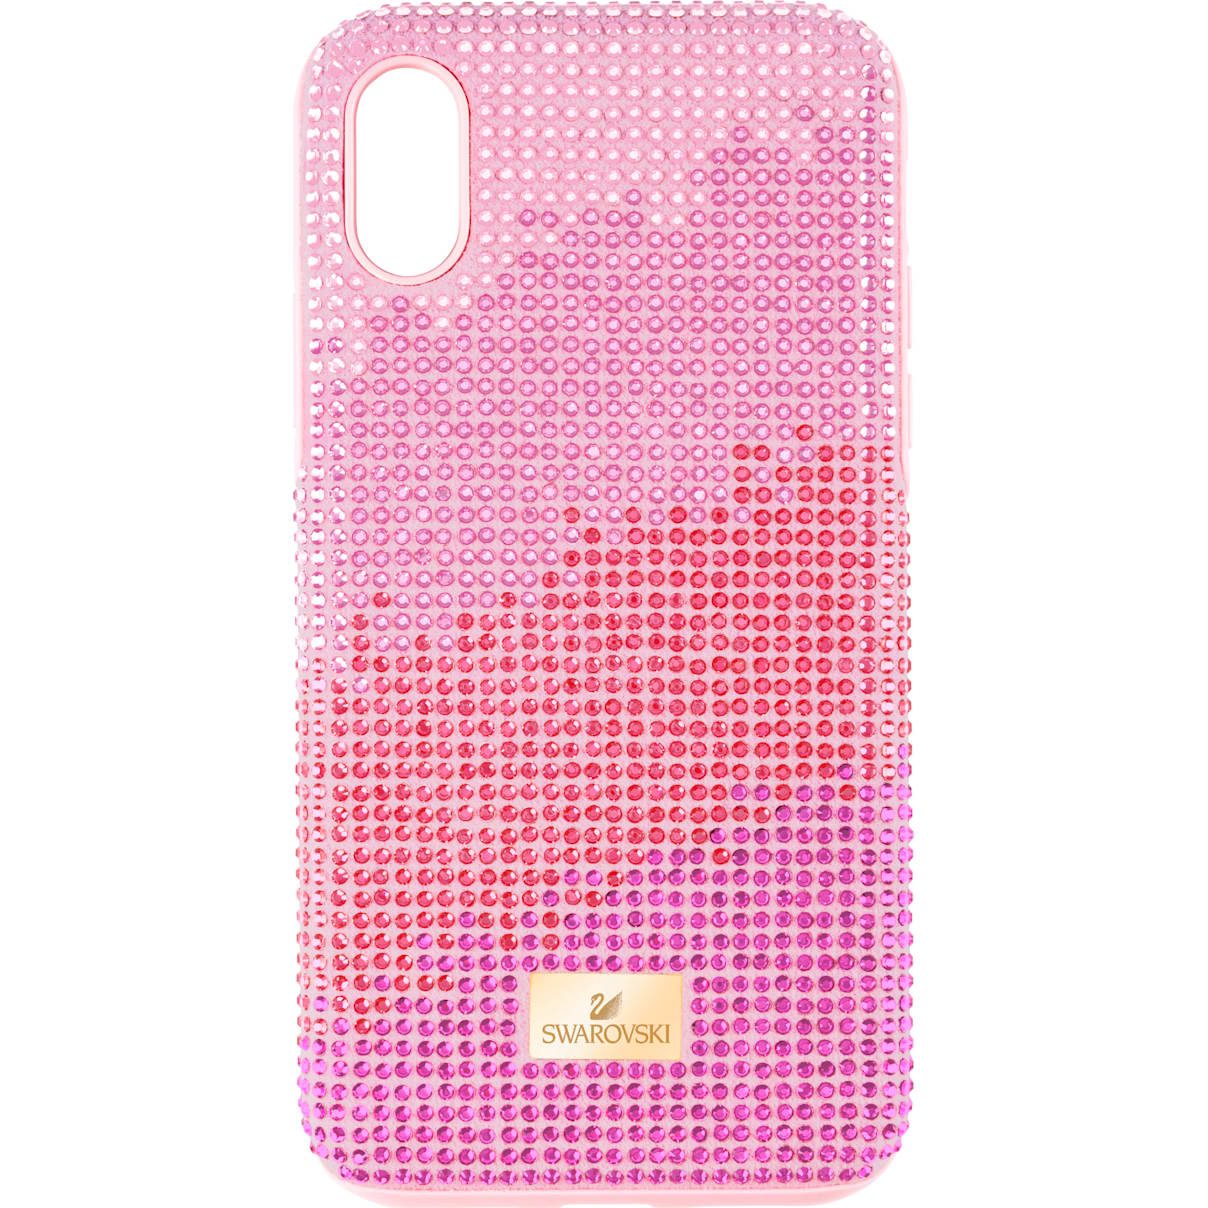 Swarovski High Love Smartphone case with Bumper, iPhone® X/XS, Pink